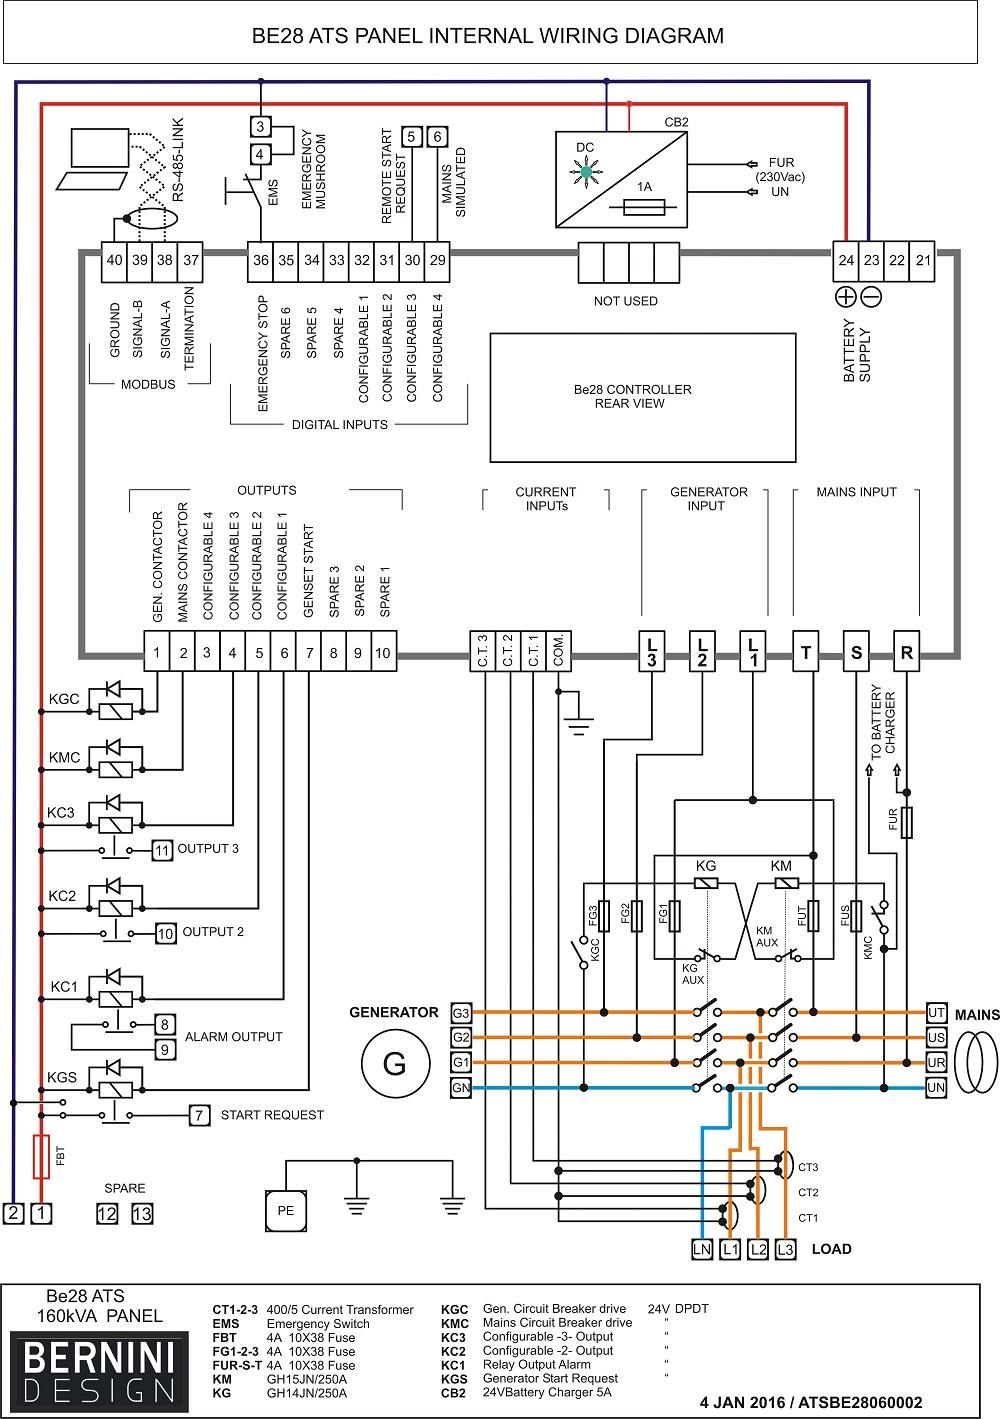 Terrific Wiring Diagram Generator Control Panel Wiring Diagram Data Wiring Cloud Animomajobocepmohammedshrineorg